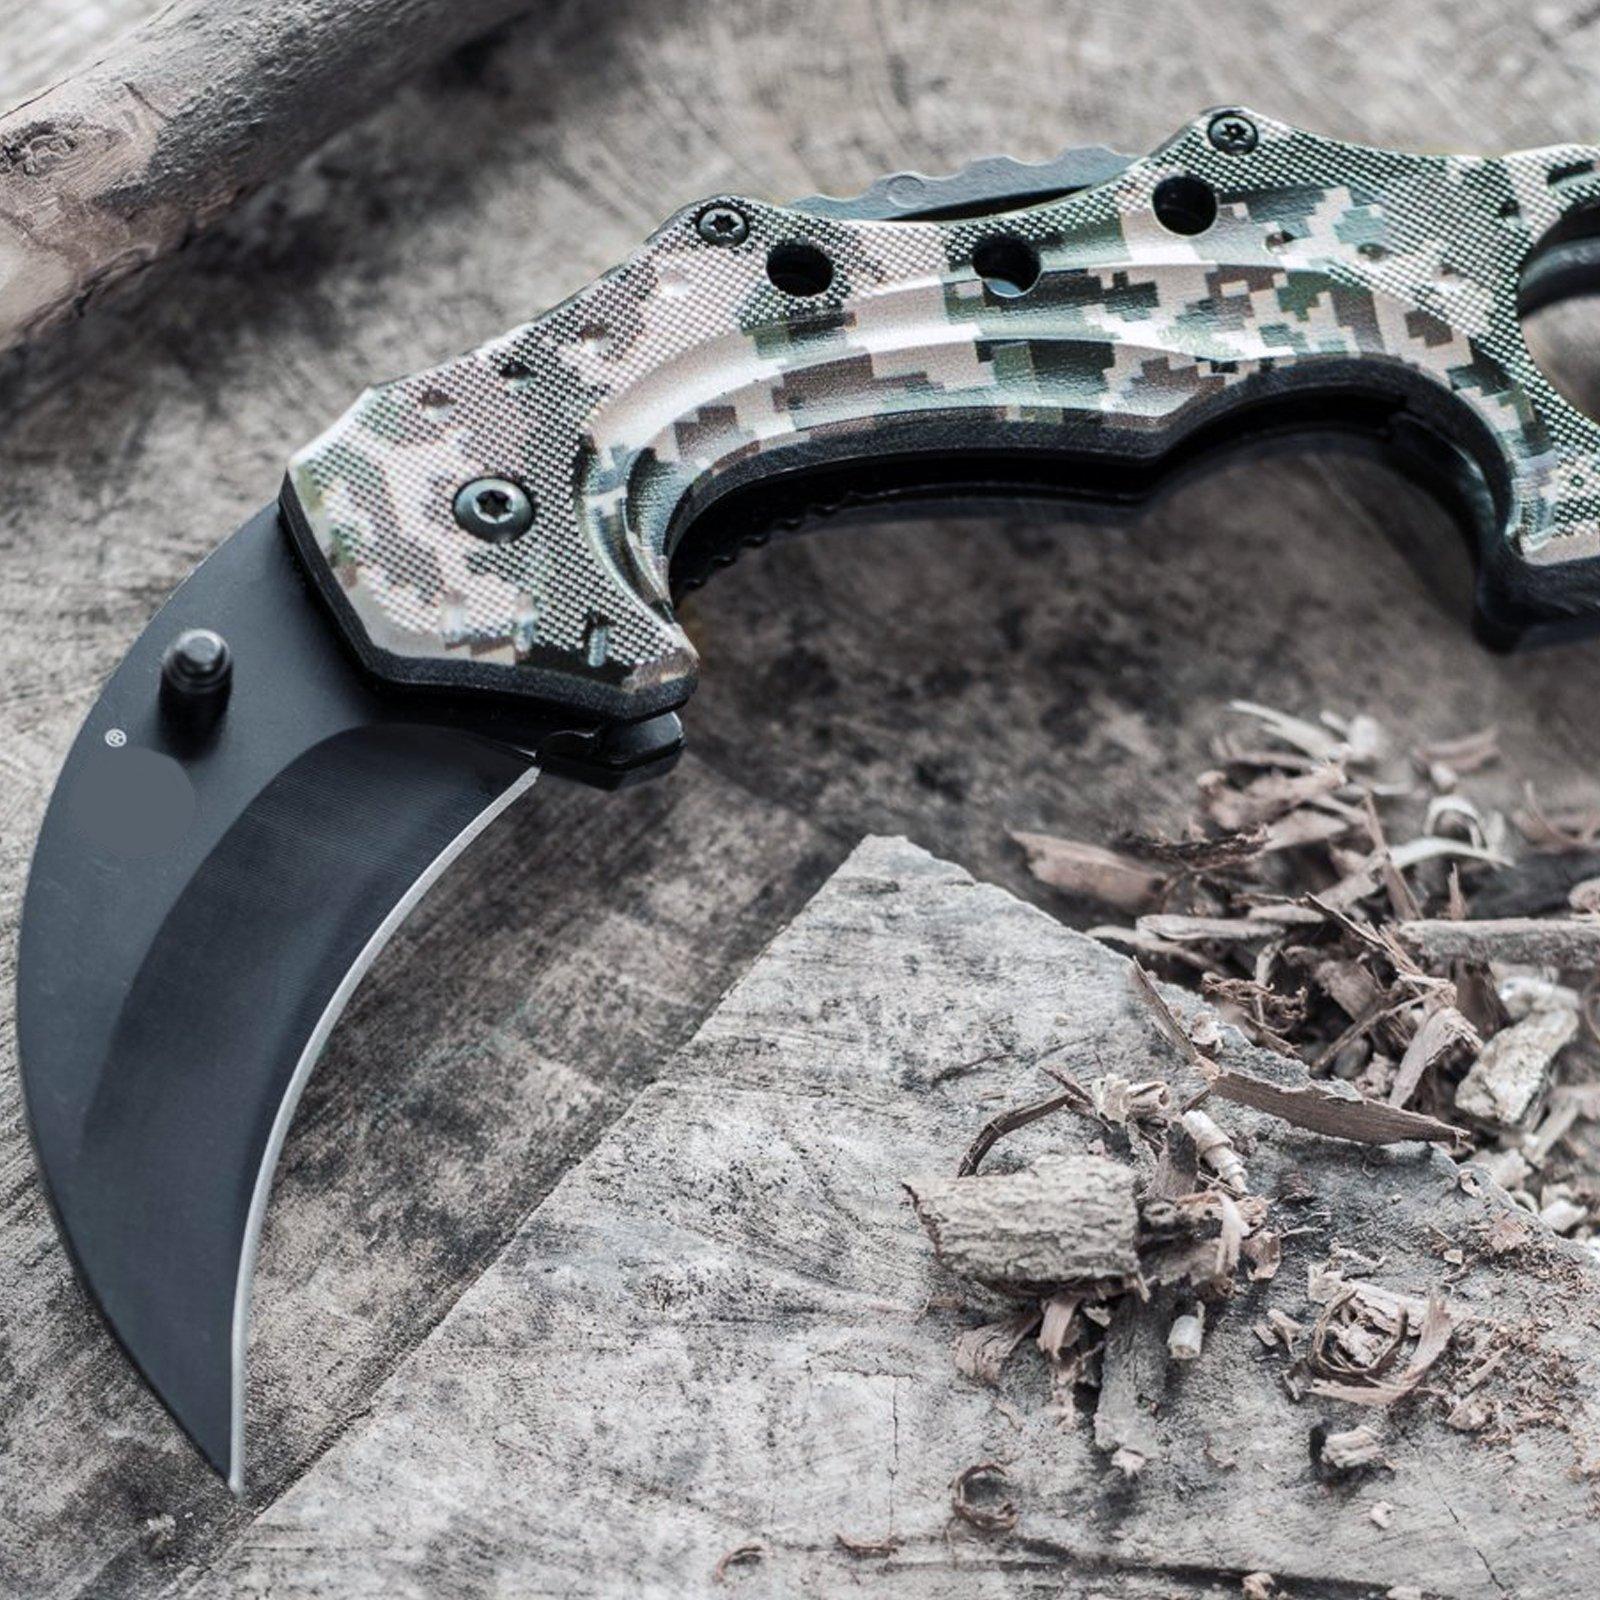 ASR-Outdoor-Hawkbill-Style-Folding-Knife-Digital-Camo-Pocket-Blade-4-Colors miniature 14